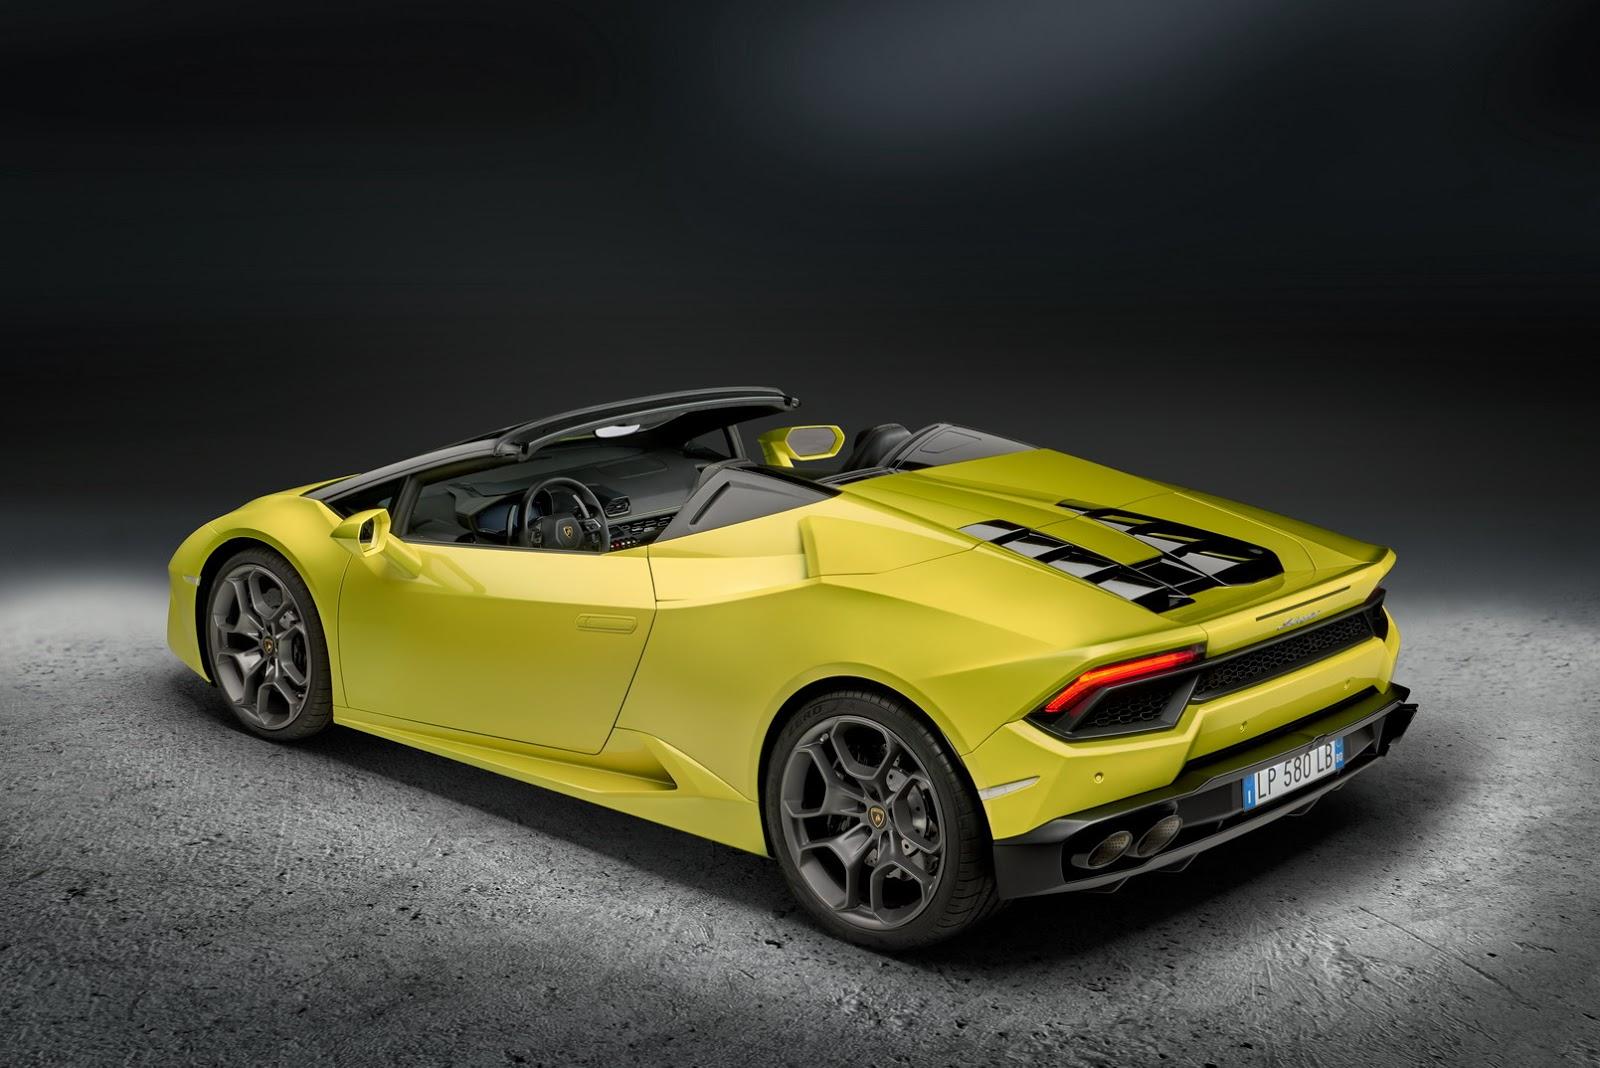 Recenze Lamborghini Huracán Spyder